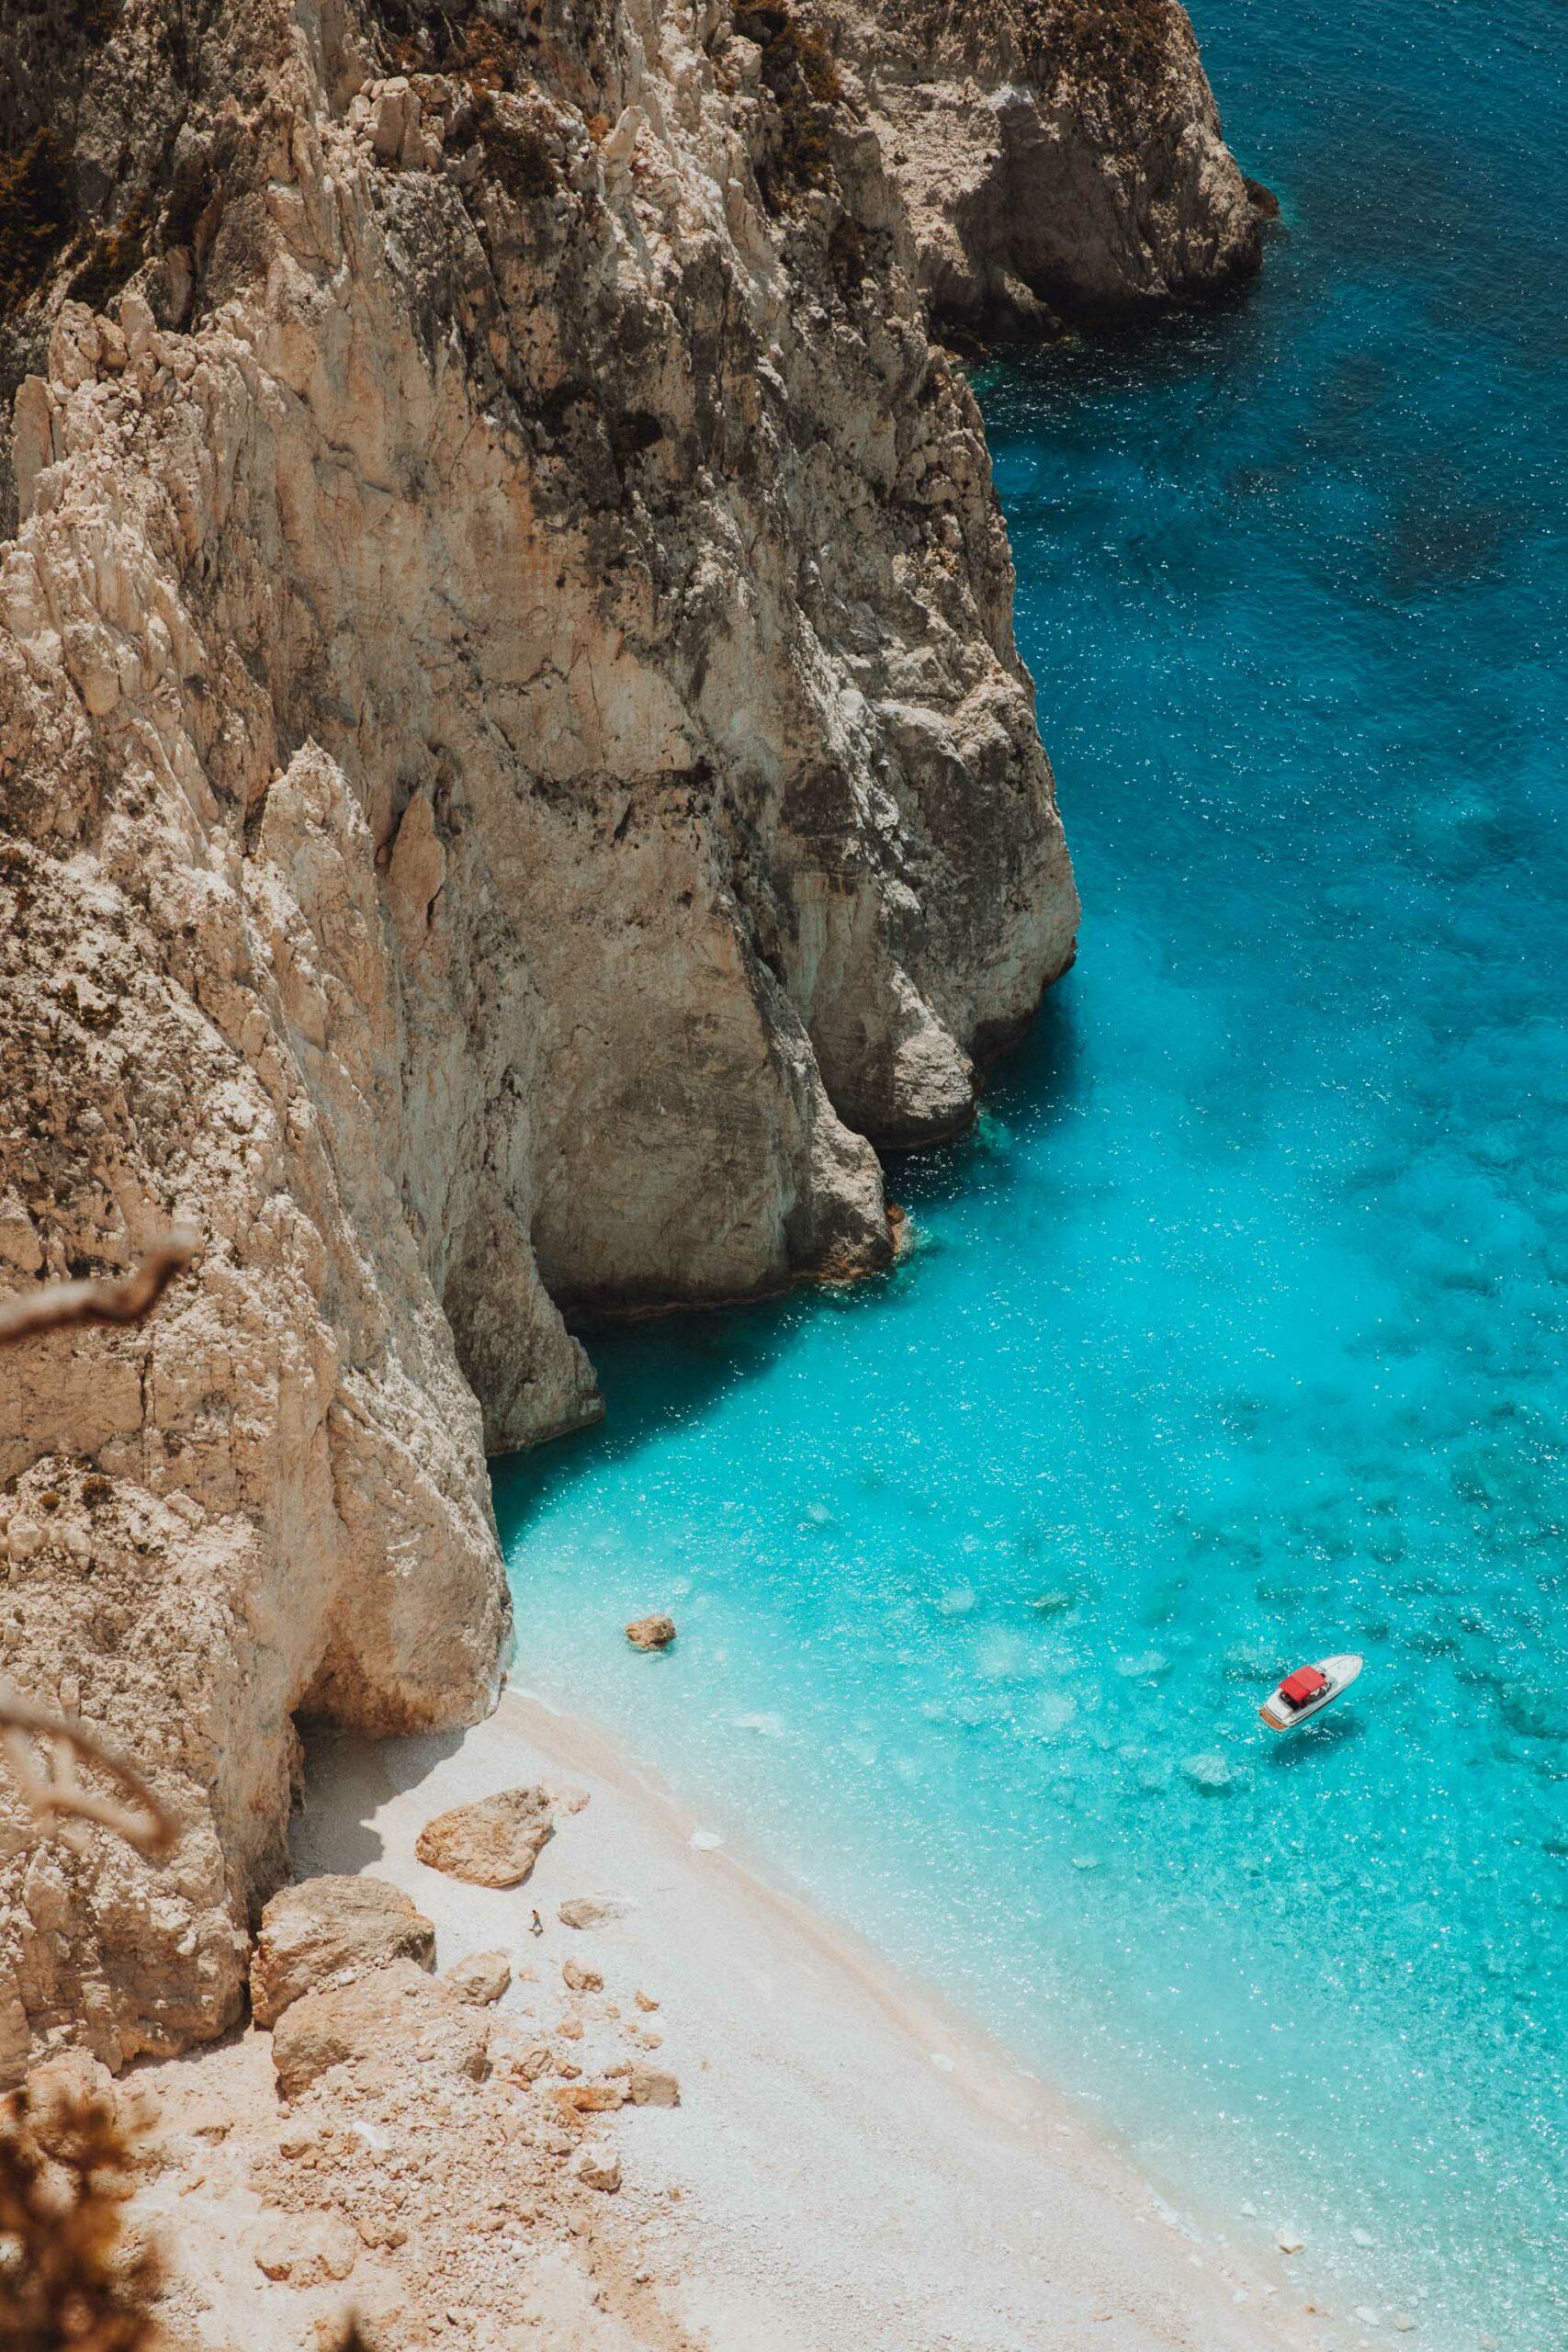 Mizithres beach viewpoint in Zakynthos Greece